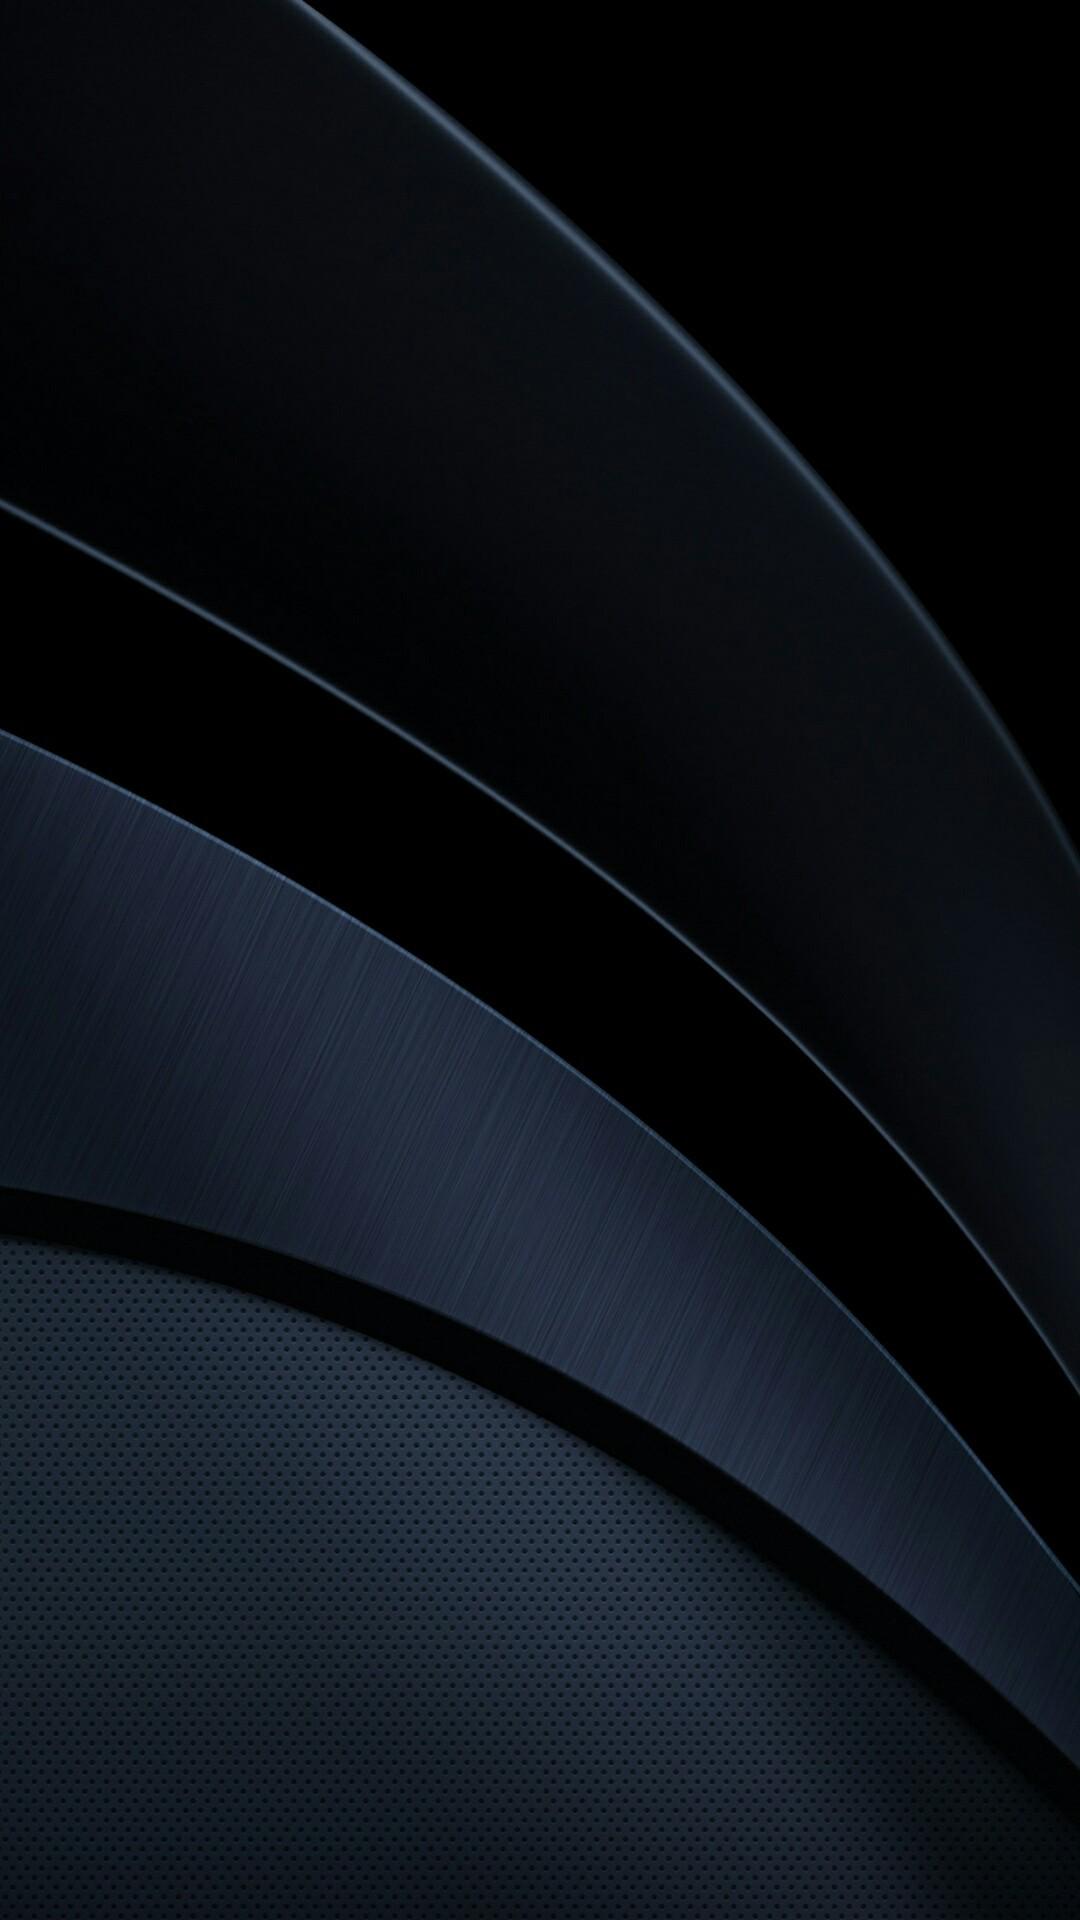 Fondos. Black WallpaperWallpaper ArtBlue …